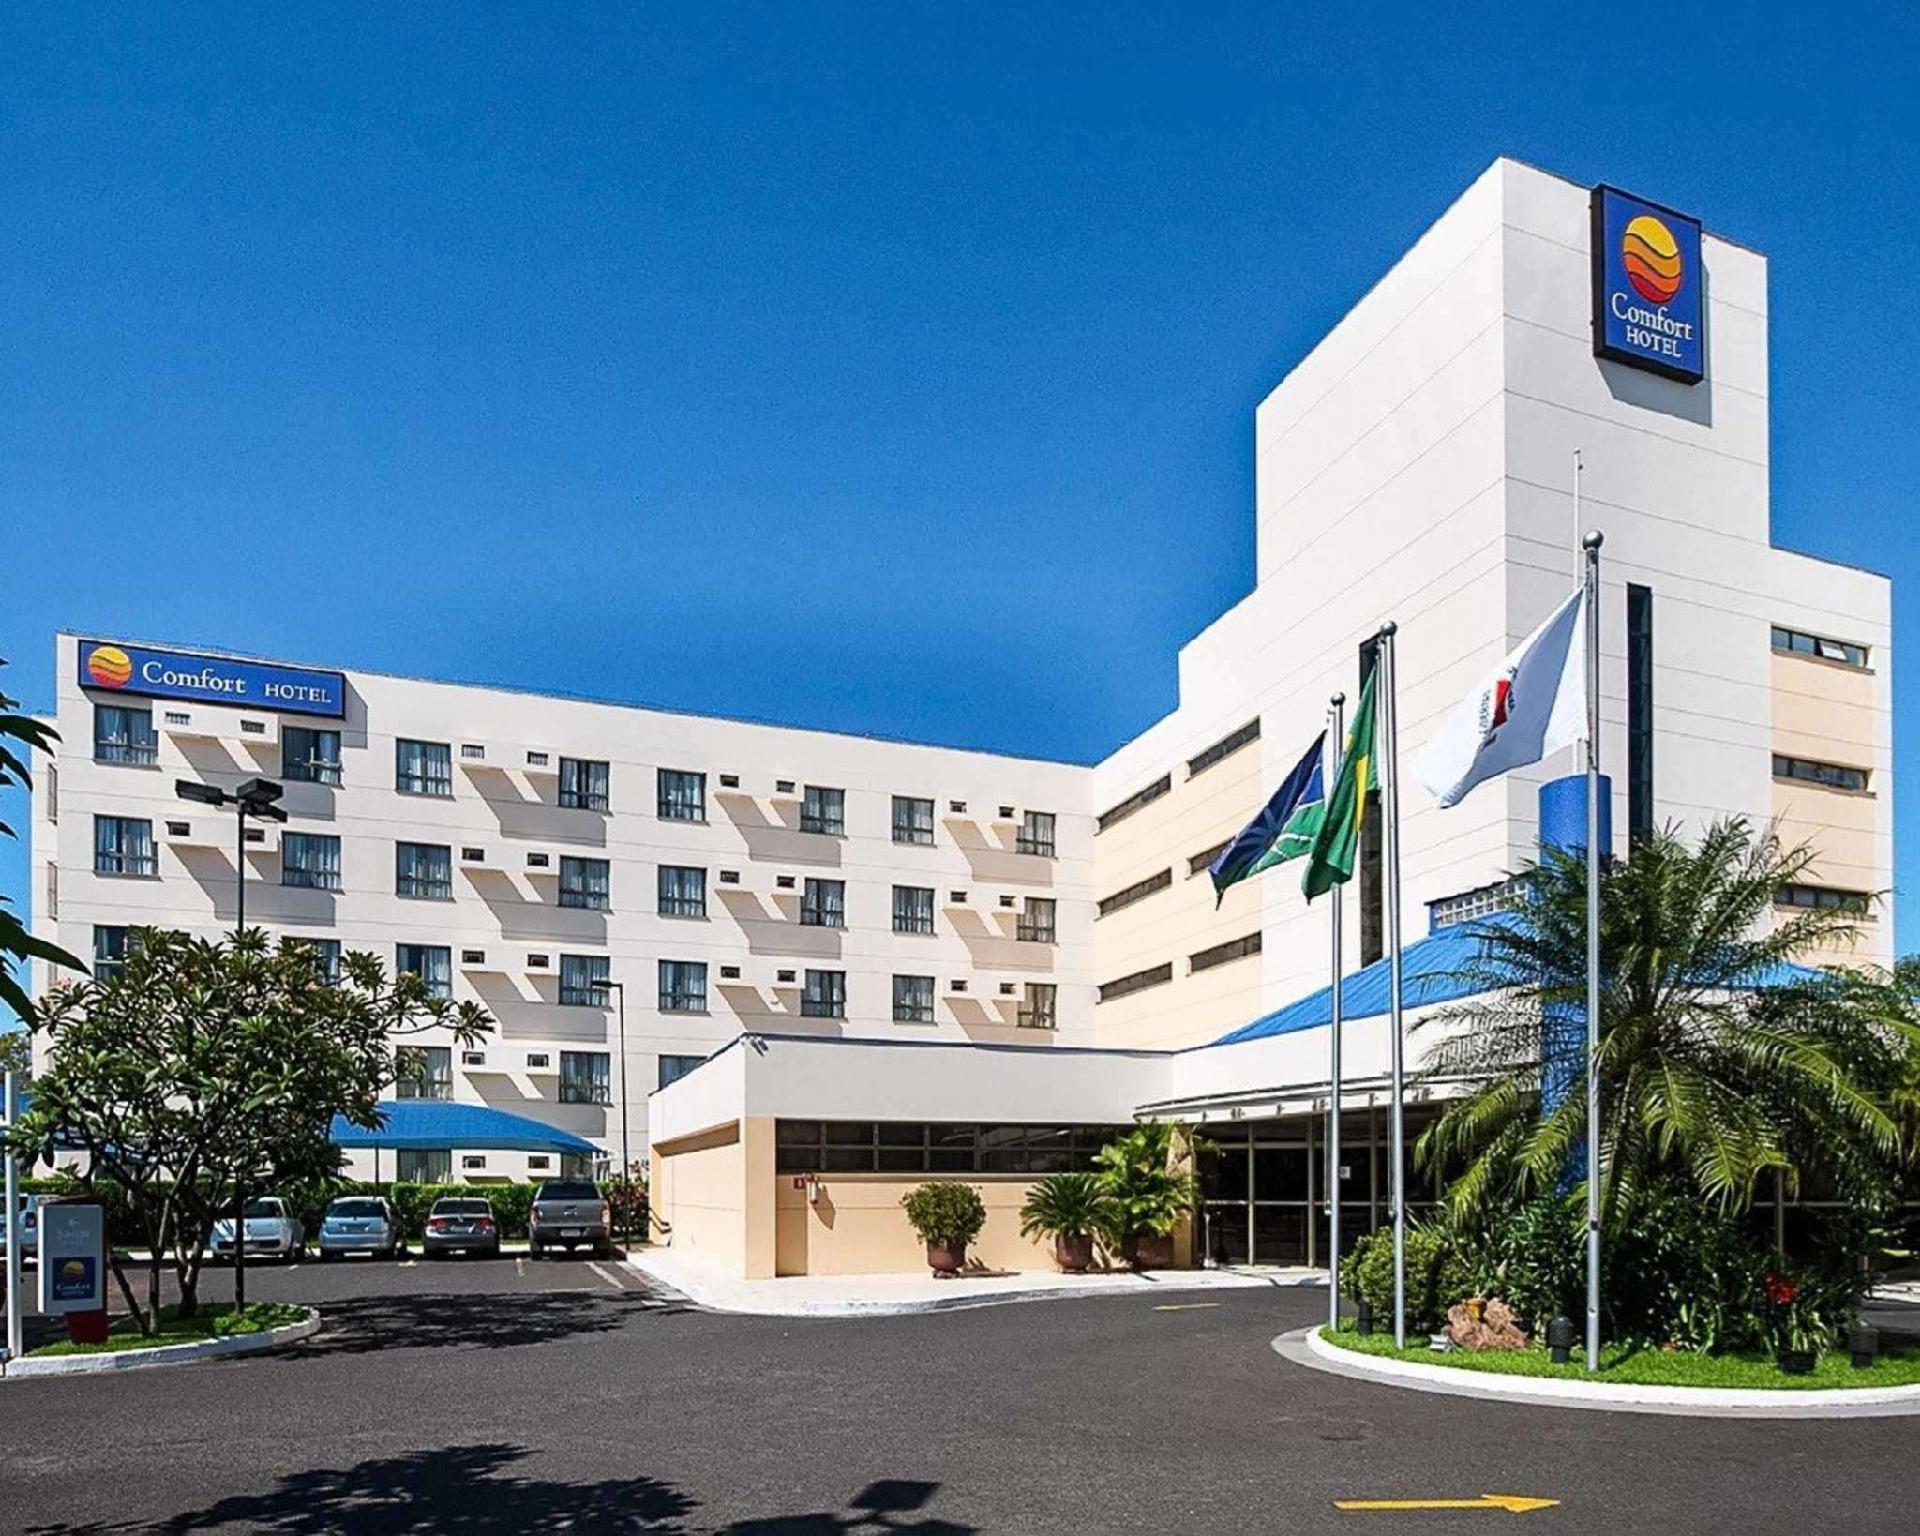 Comfort Hotel Uberlandia Uberlandia, Uberlândia